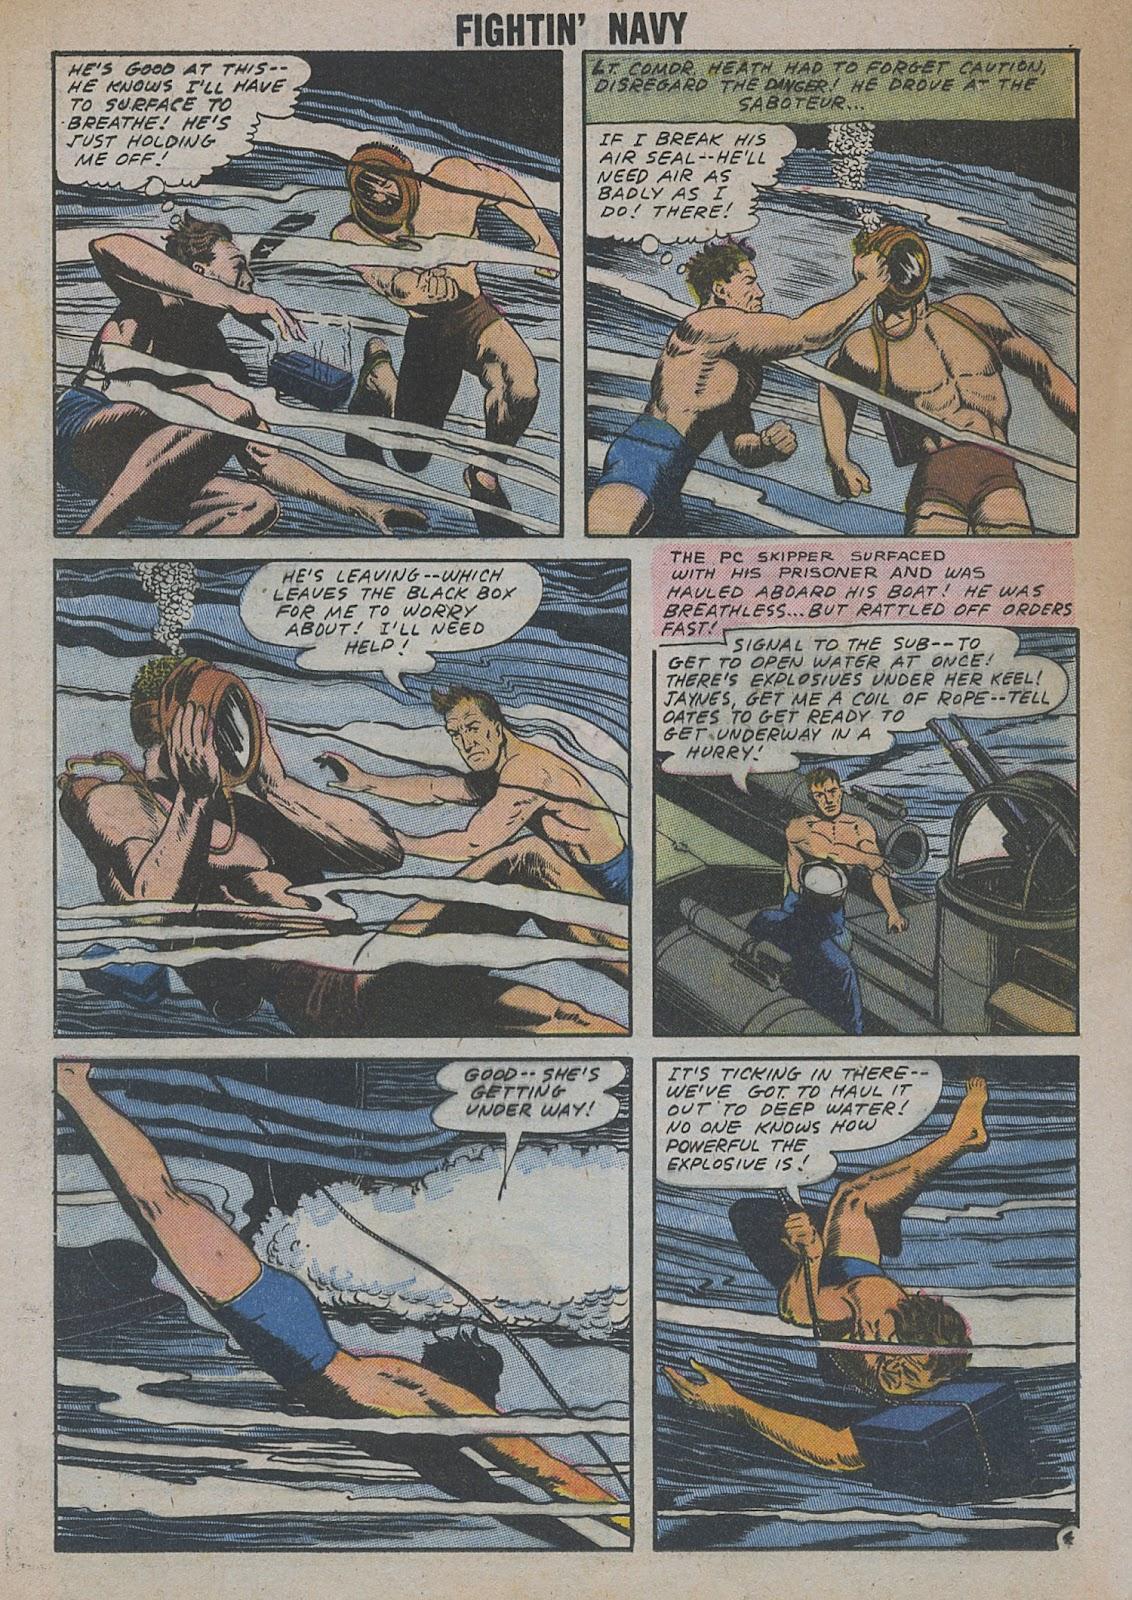 Read online Fightin' Navy comic -  Issue #82 - 46